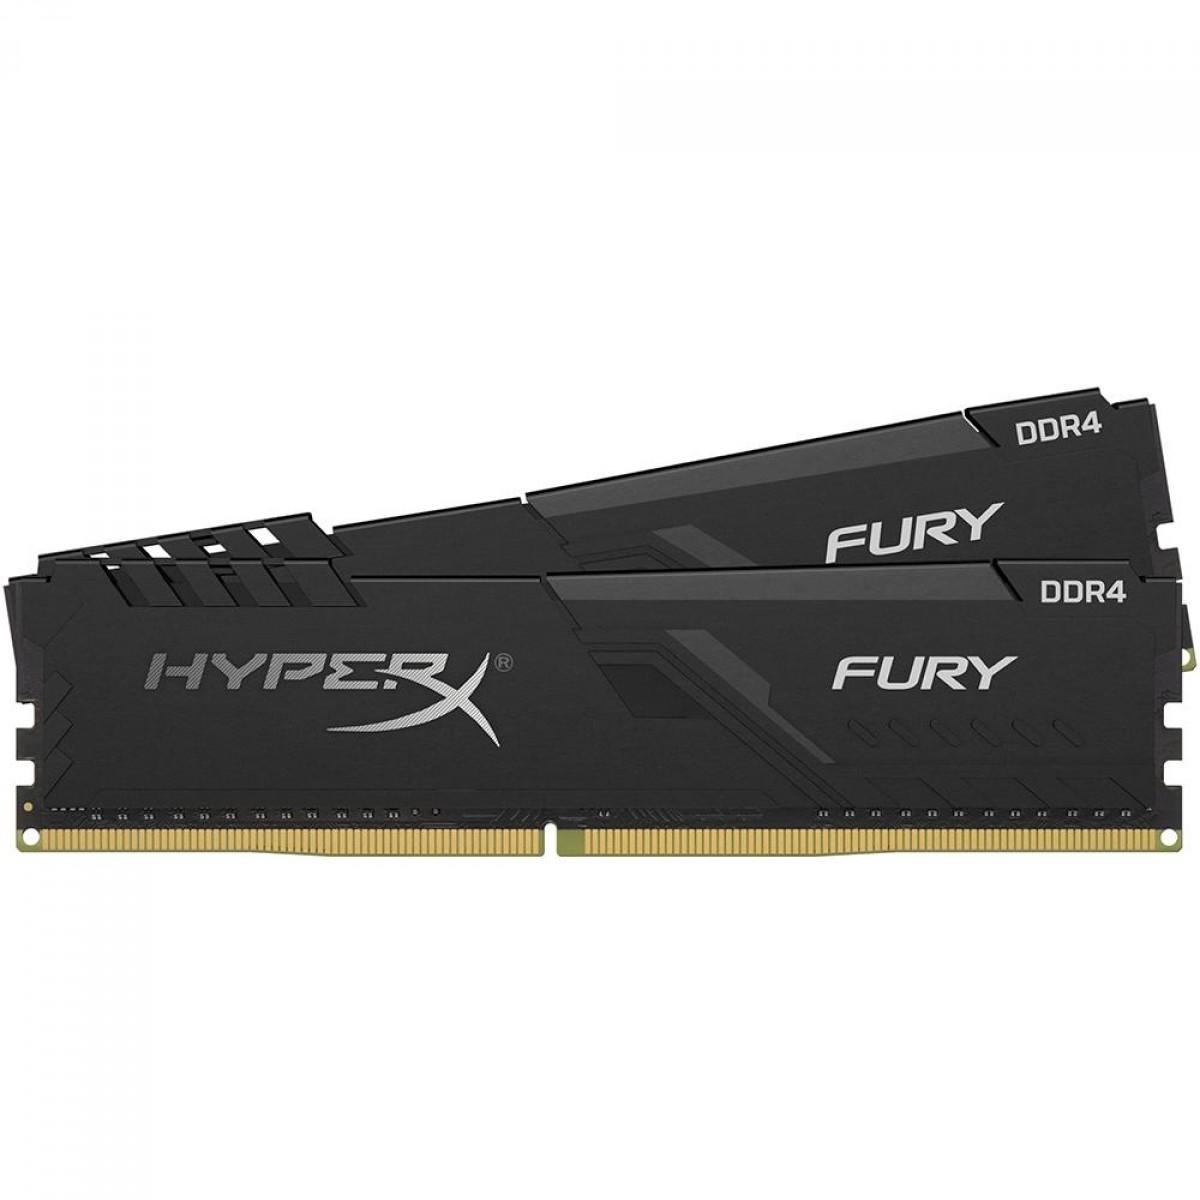 Memória DDR4 HyperX Fury, 16GB (2x8GB), 2400MHz, Black, HX424C15FB3K2/16